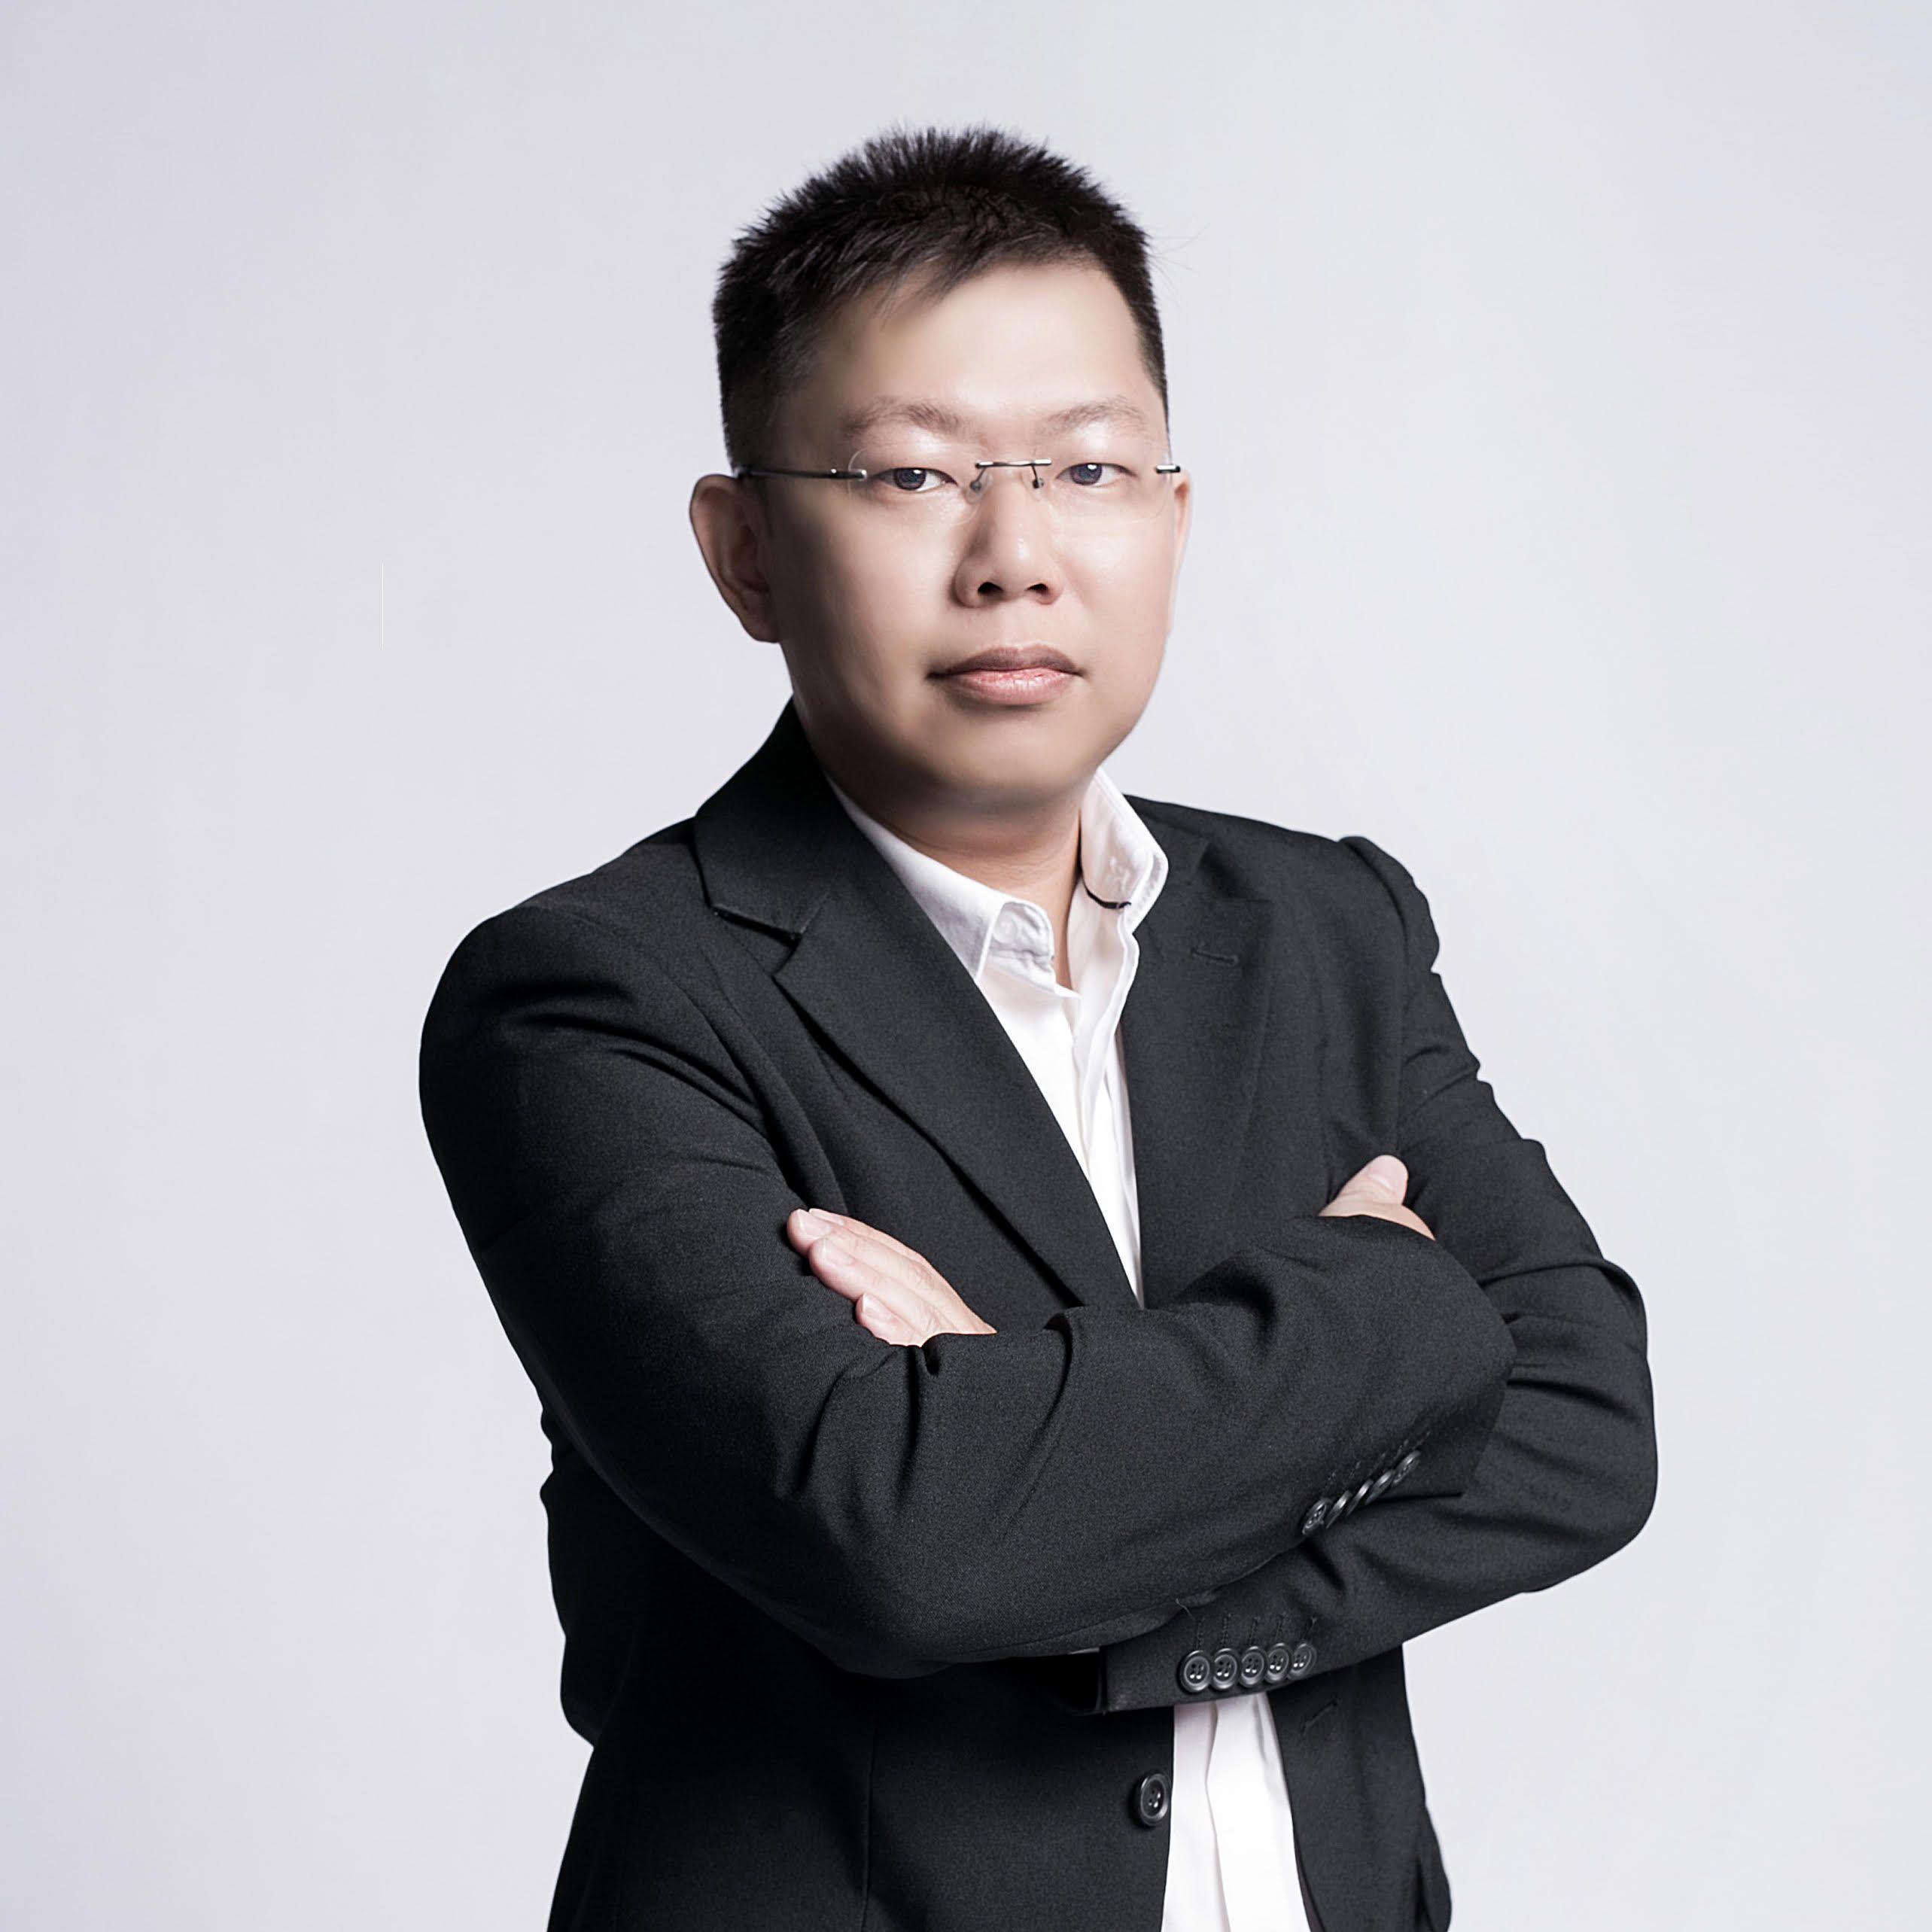 Soo Wang Chew